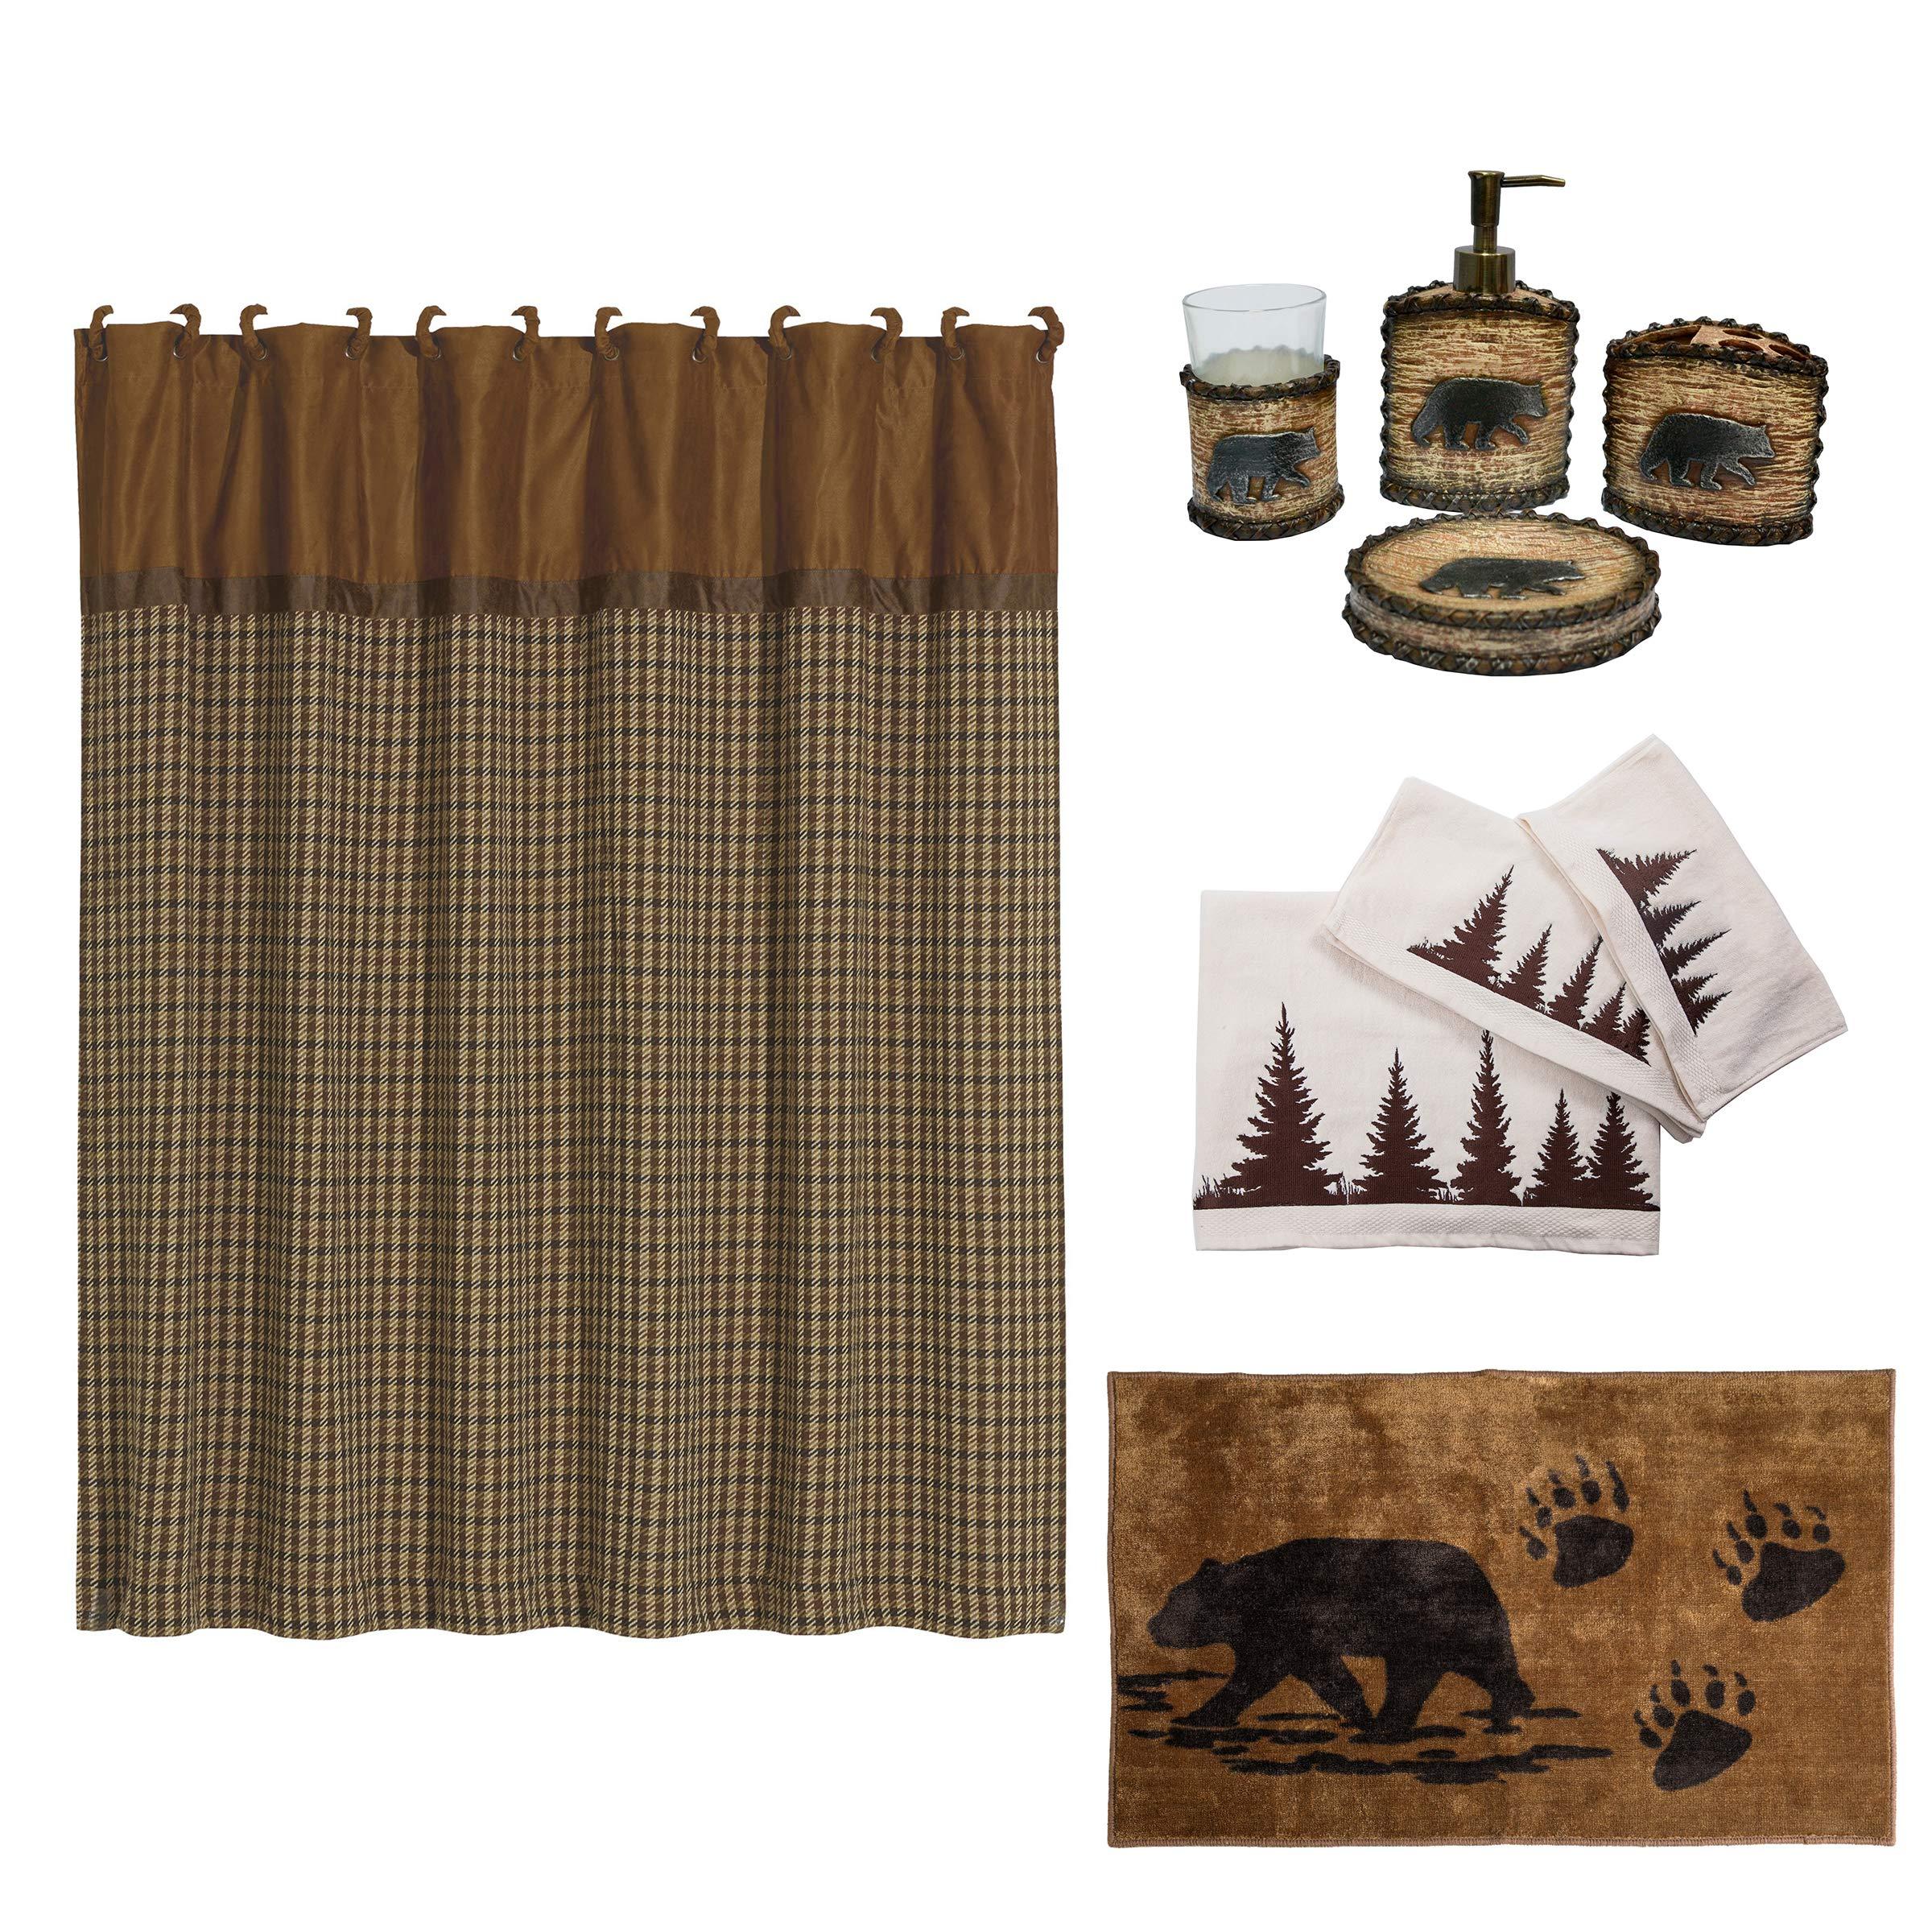 HiEnd Accents Bear 21-Piece Bathroom, Shower Curtain Hook, Bath Accessory, Rug, Towel Set, Tan